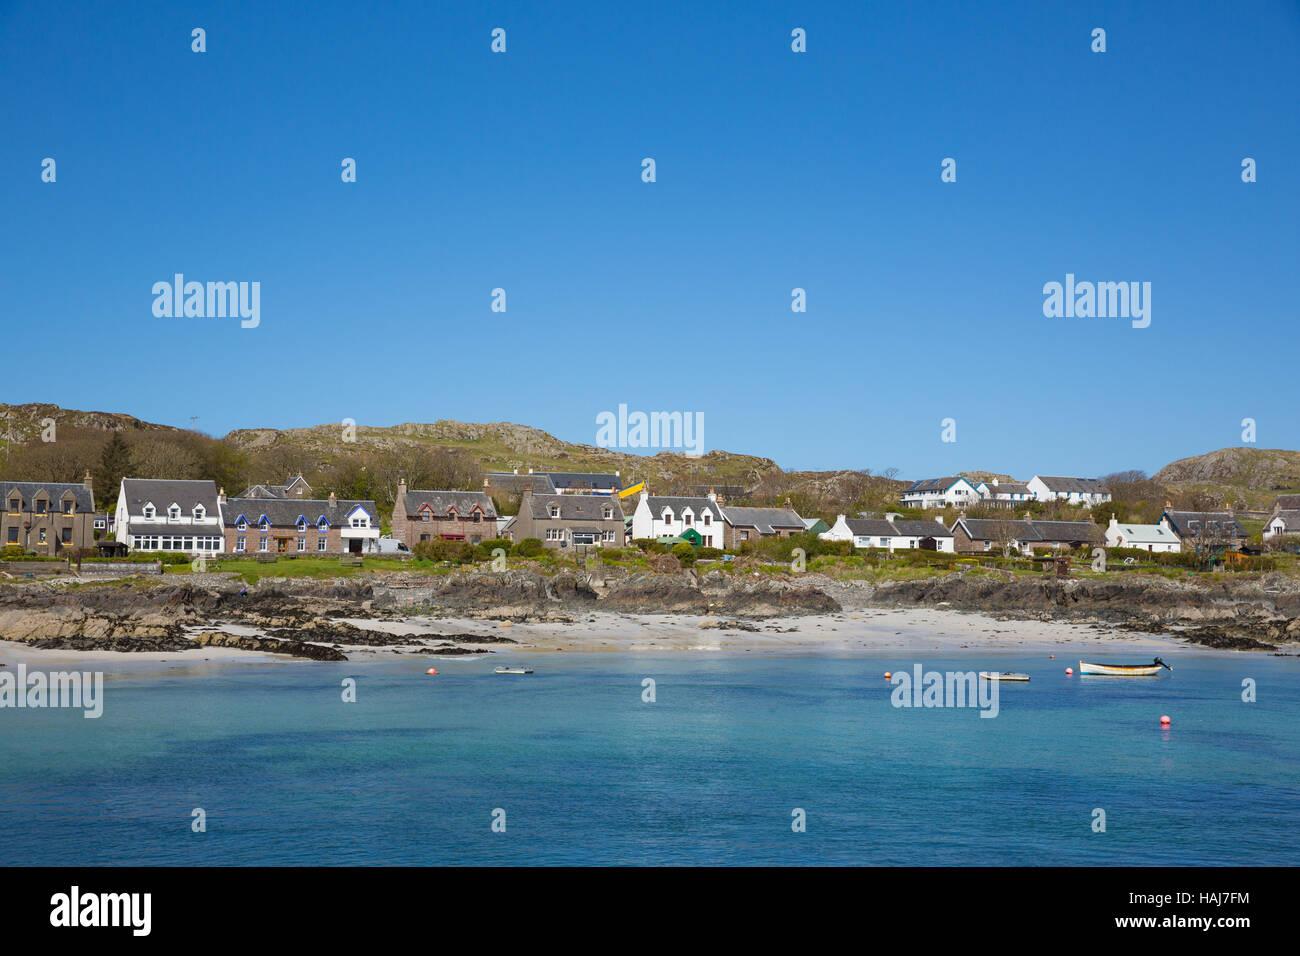 Island village on Iona Scotland uk Inner Hebrides off the Isle of Mull west coast of Scotland clear blue sea - Stock Image